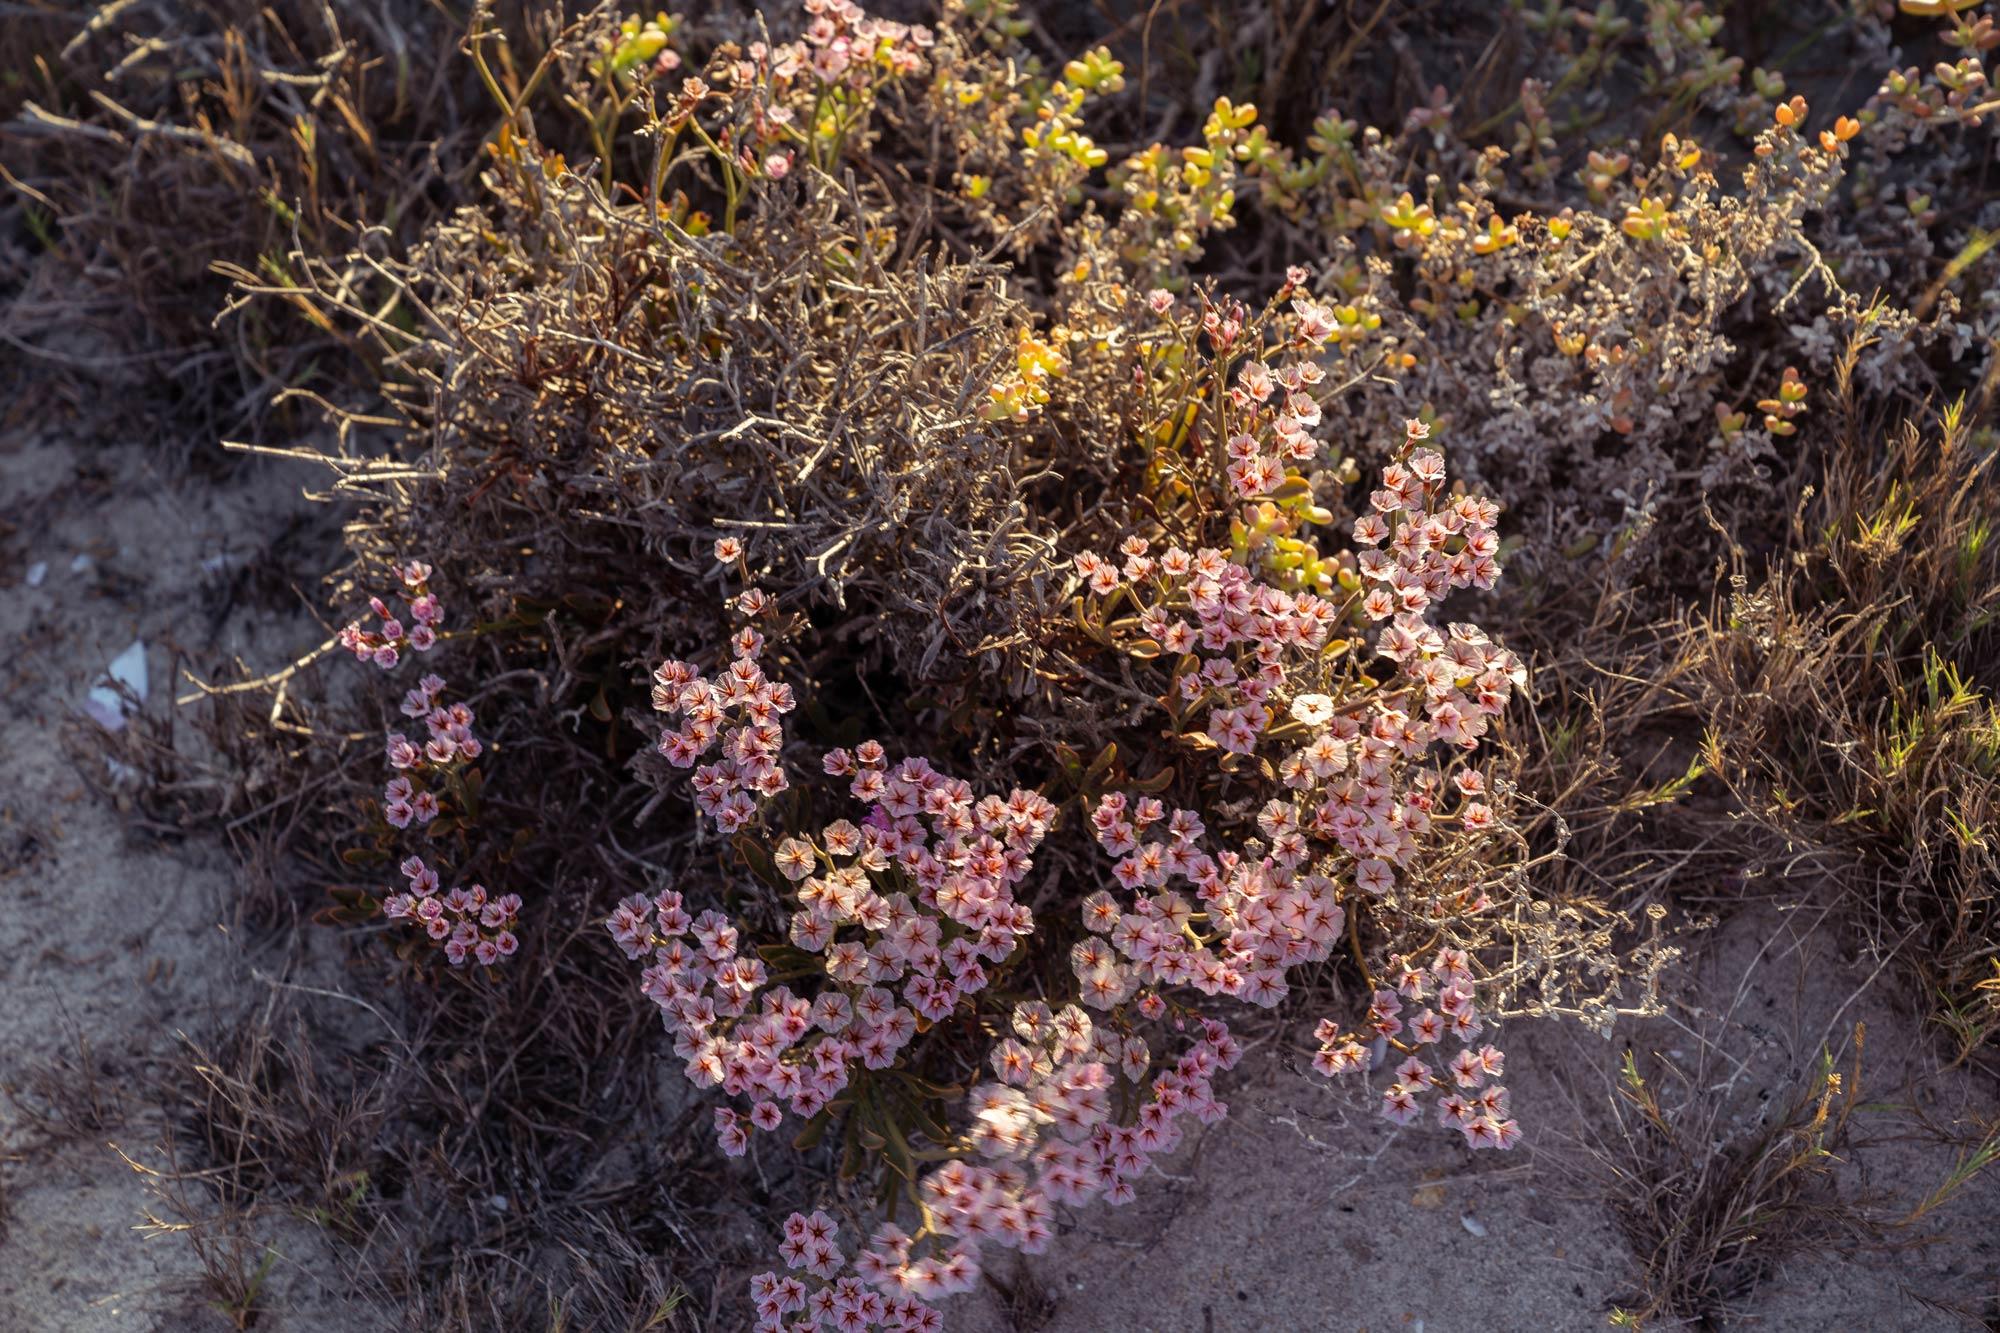 Succulent Karoo Image Copyright Soonafternoon